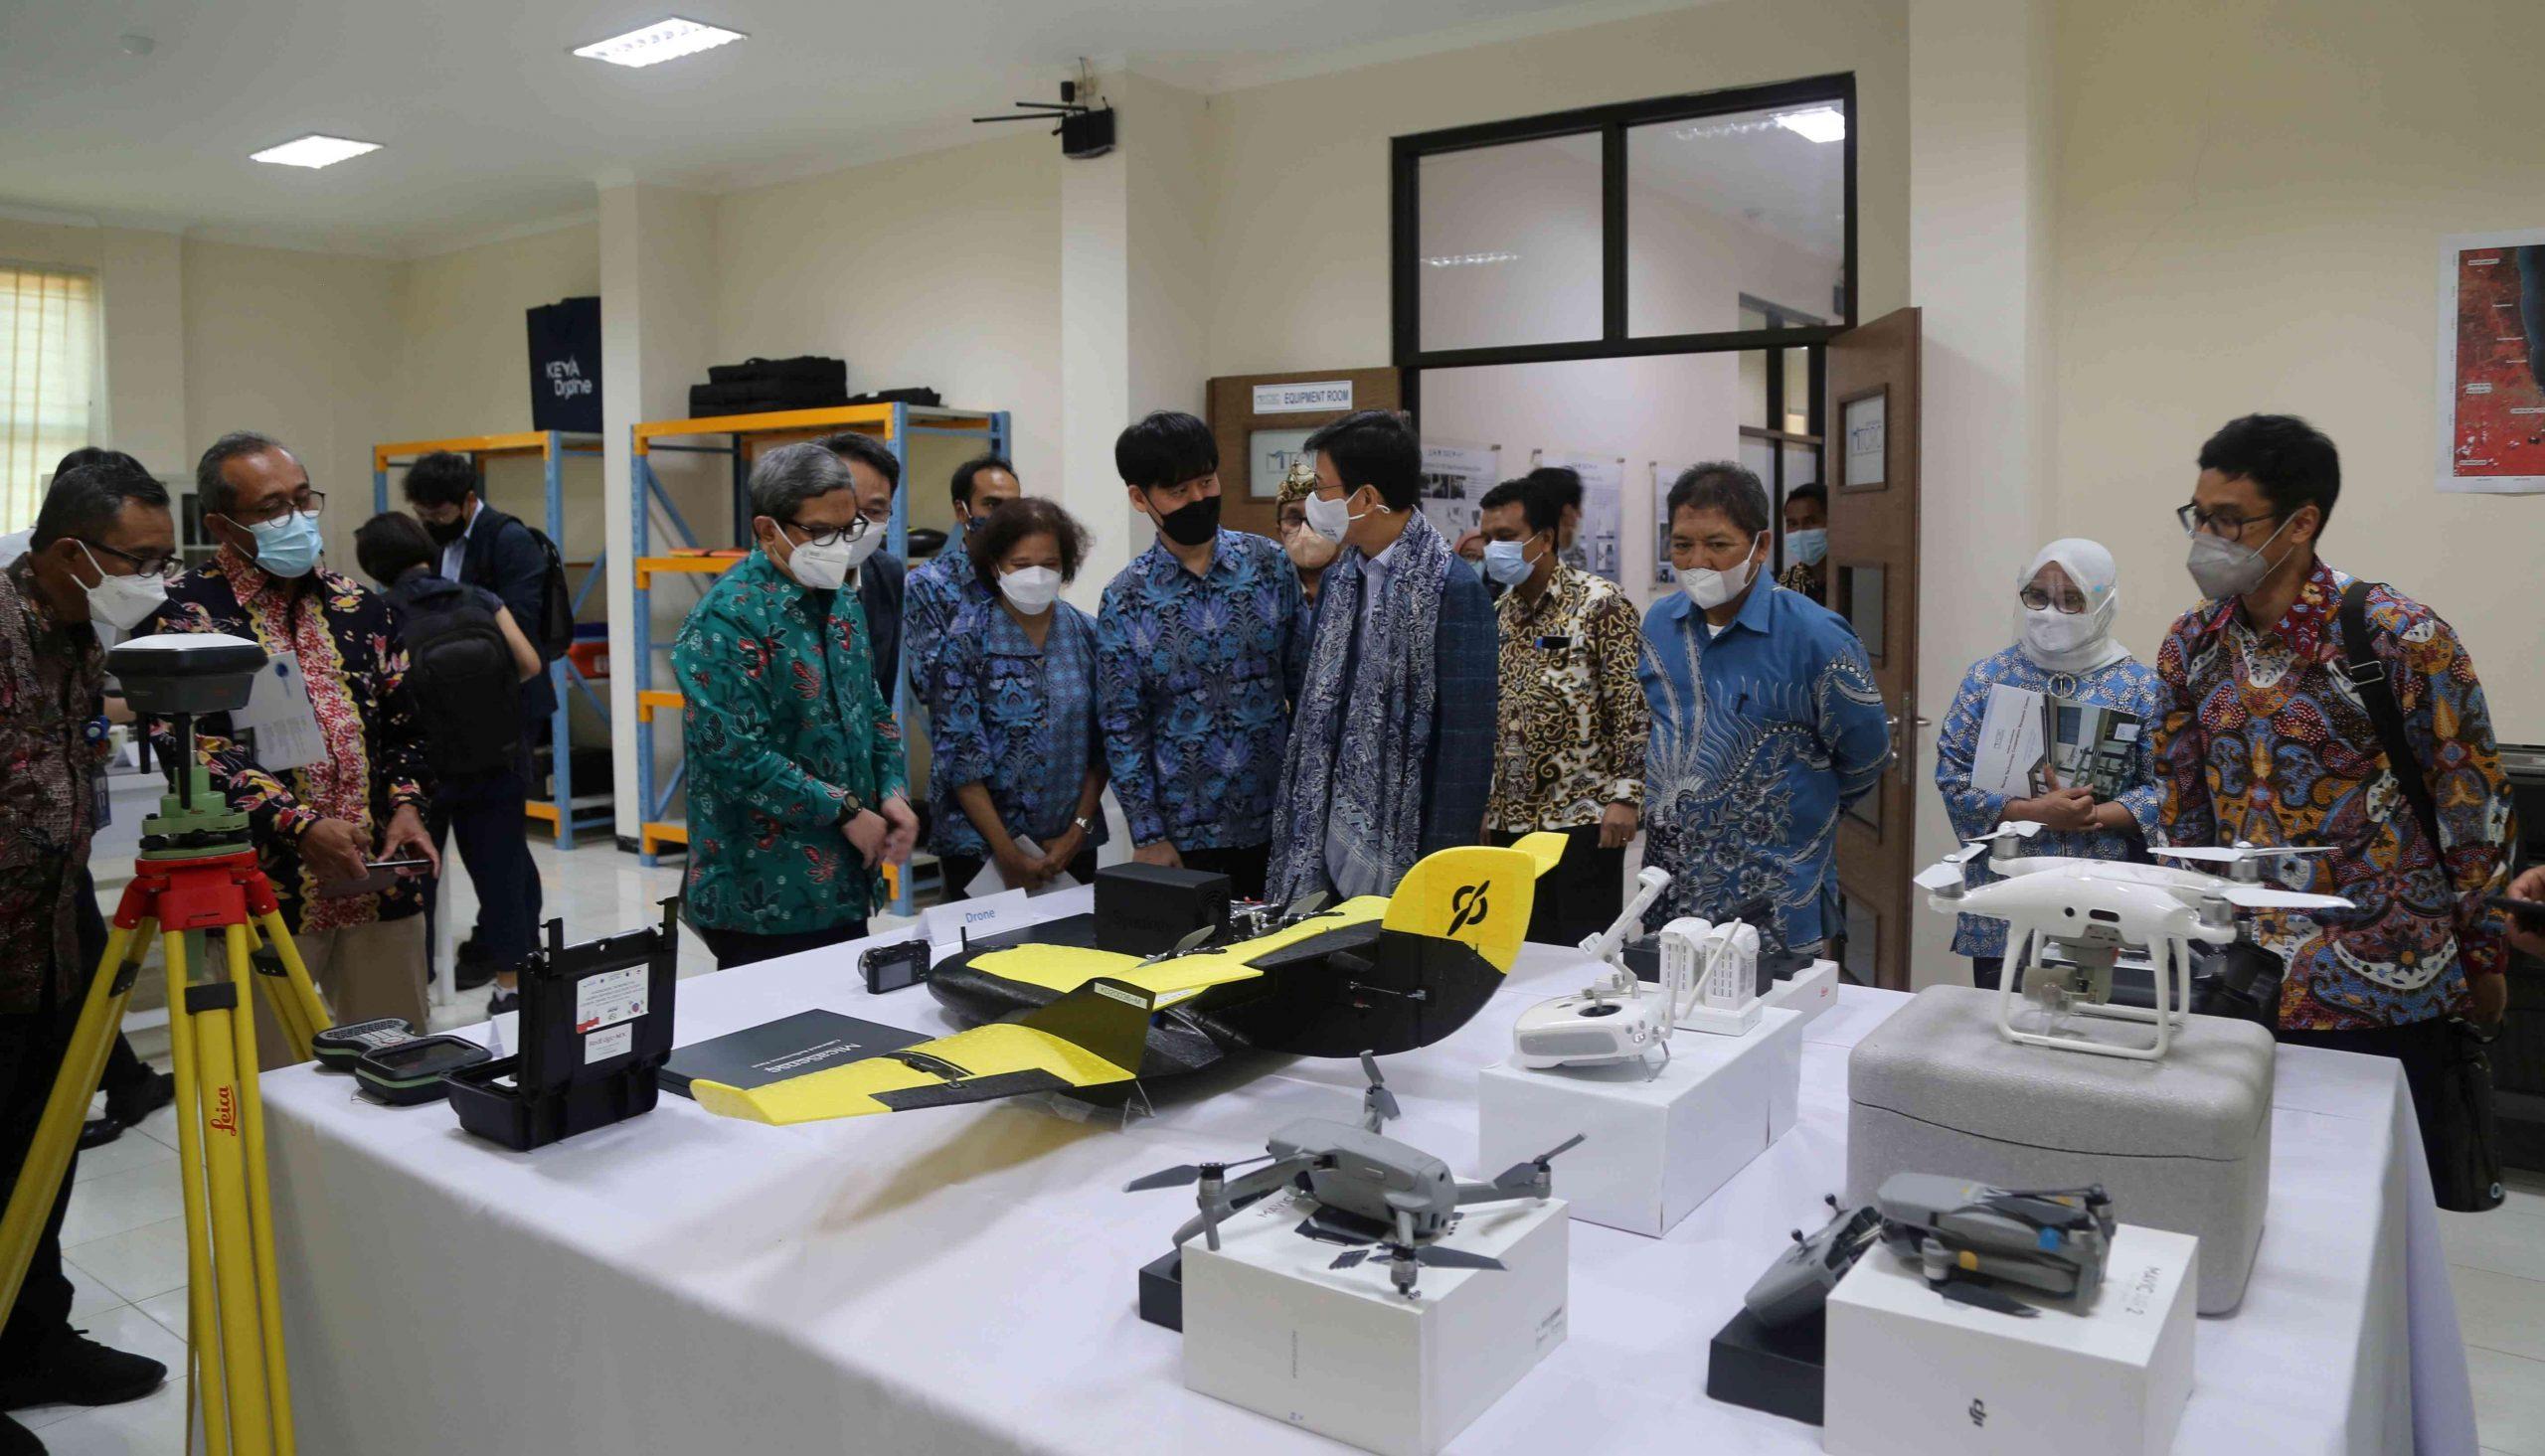 Kapal Riset FITB Perkuat Perencanaan di Perairan Cirebon